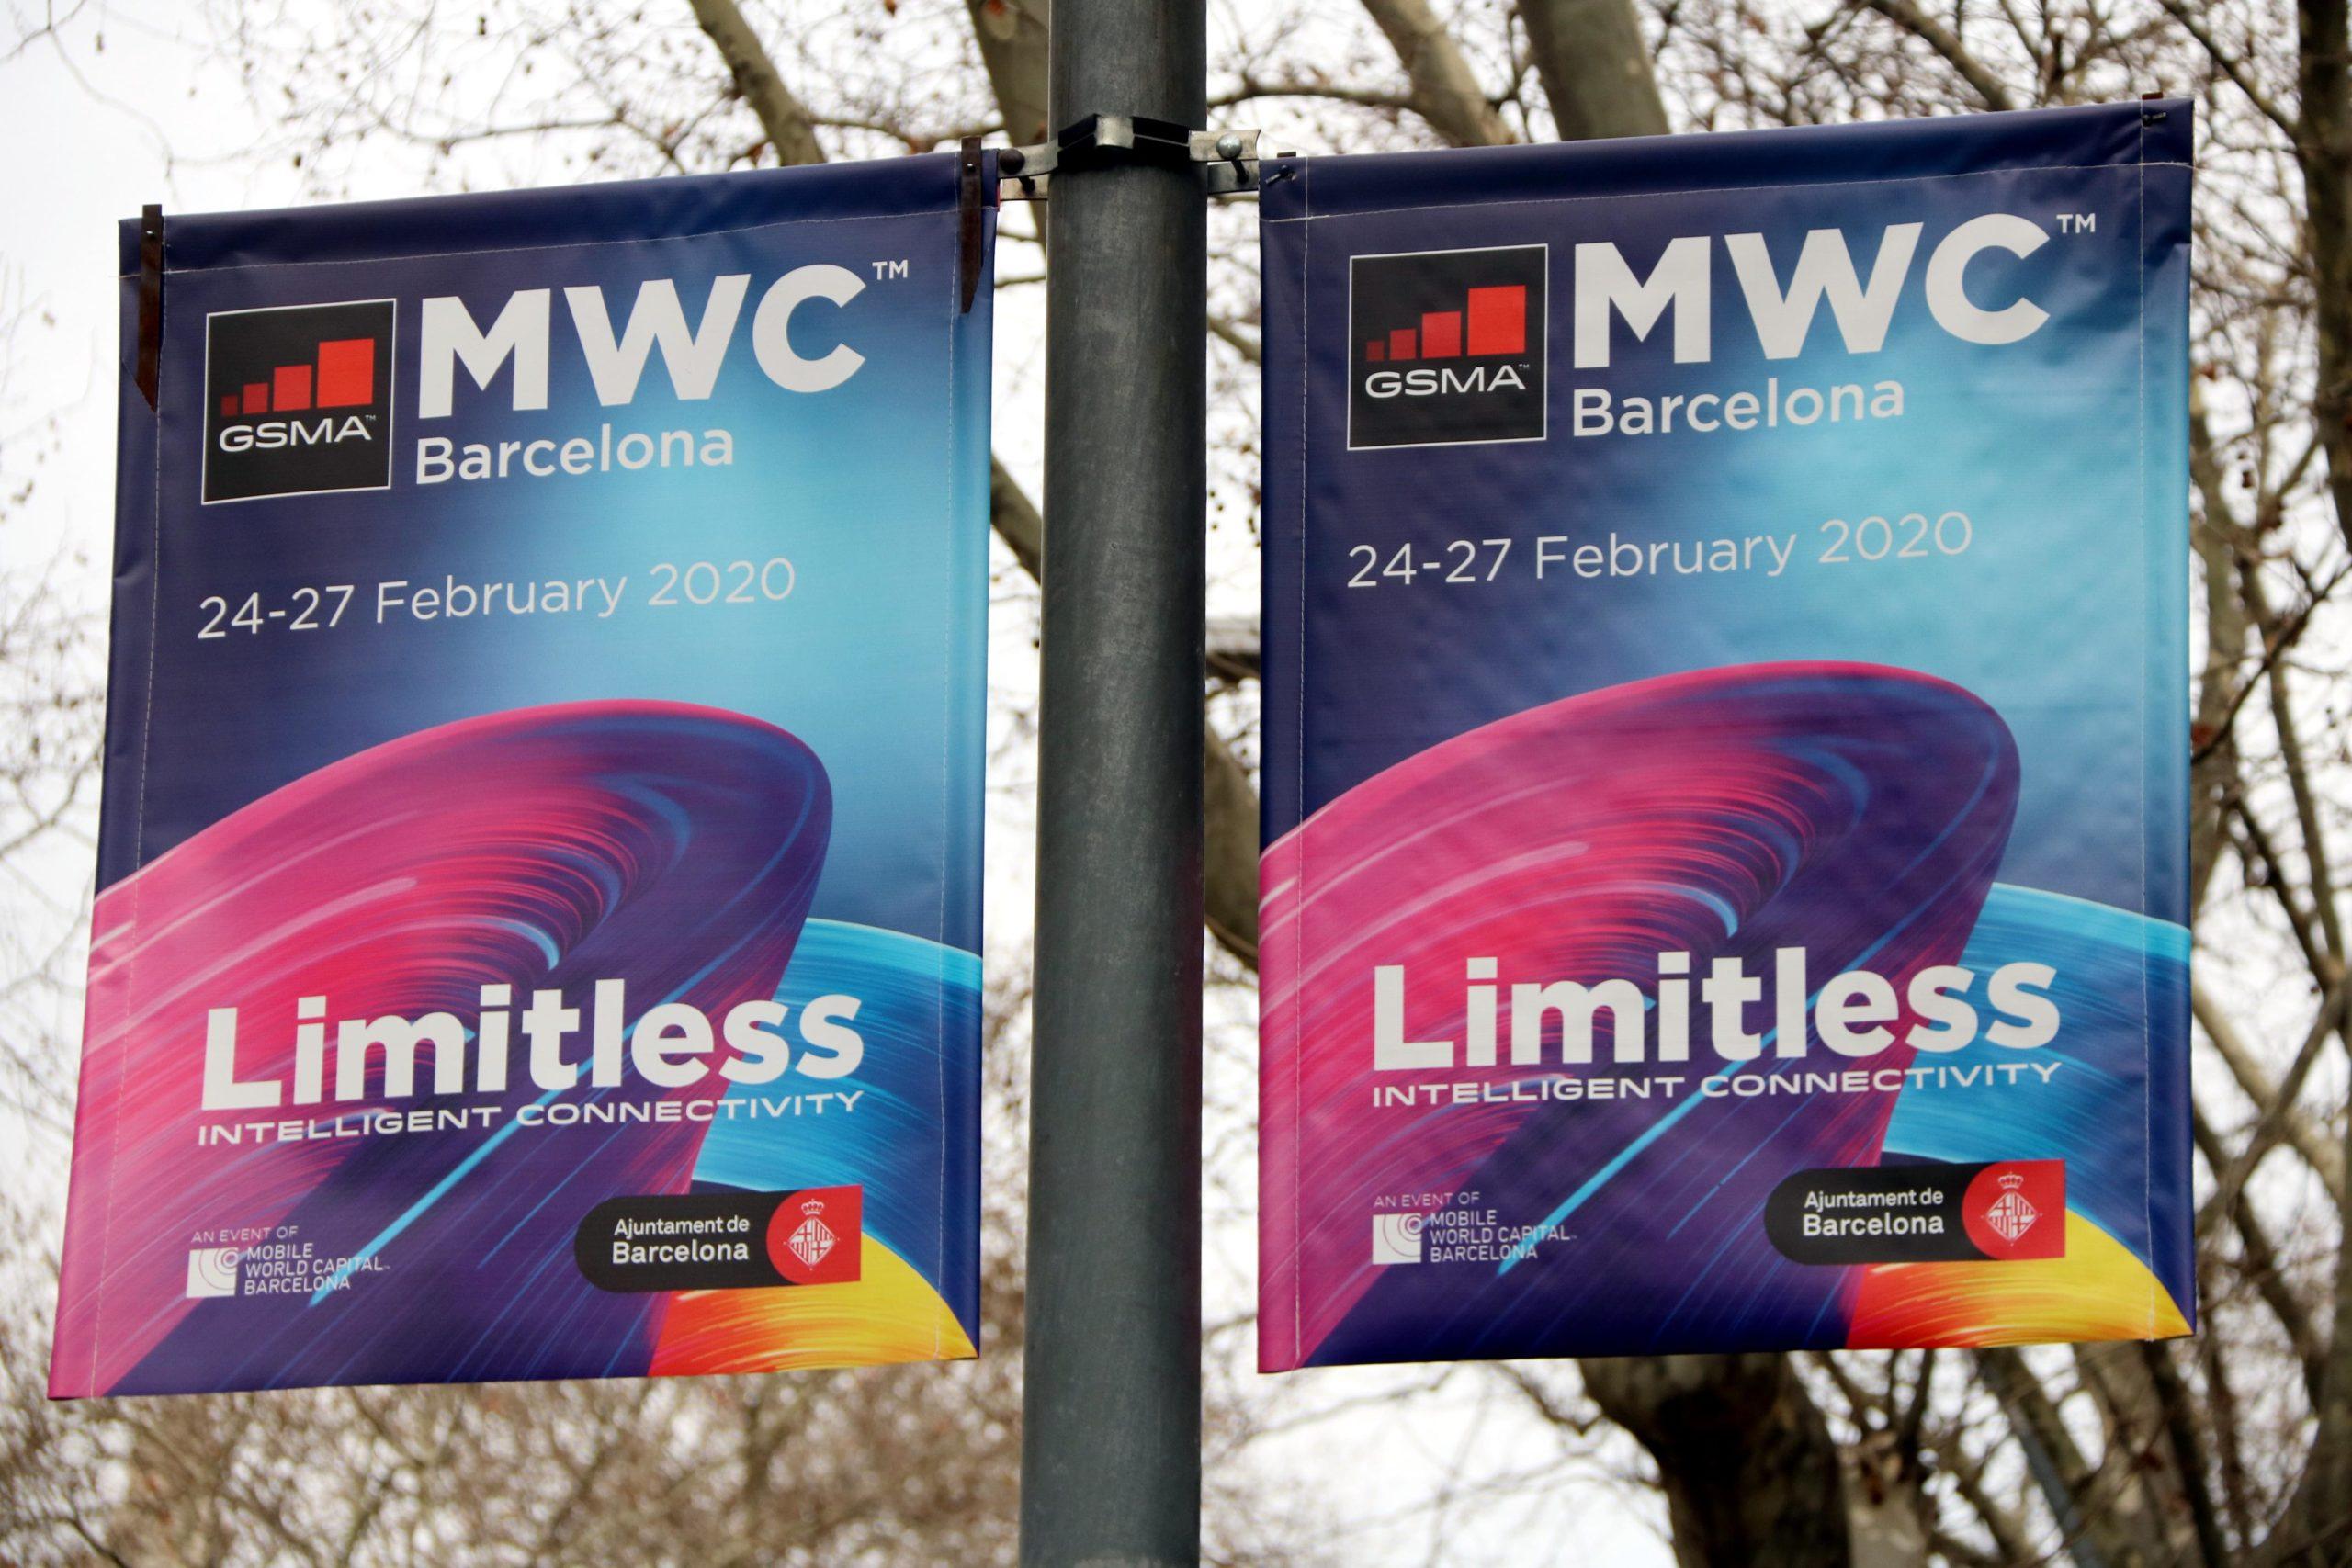 Publicitat del Mobile World Congress (MWC) 2020 a la Gran Via / ACN